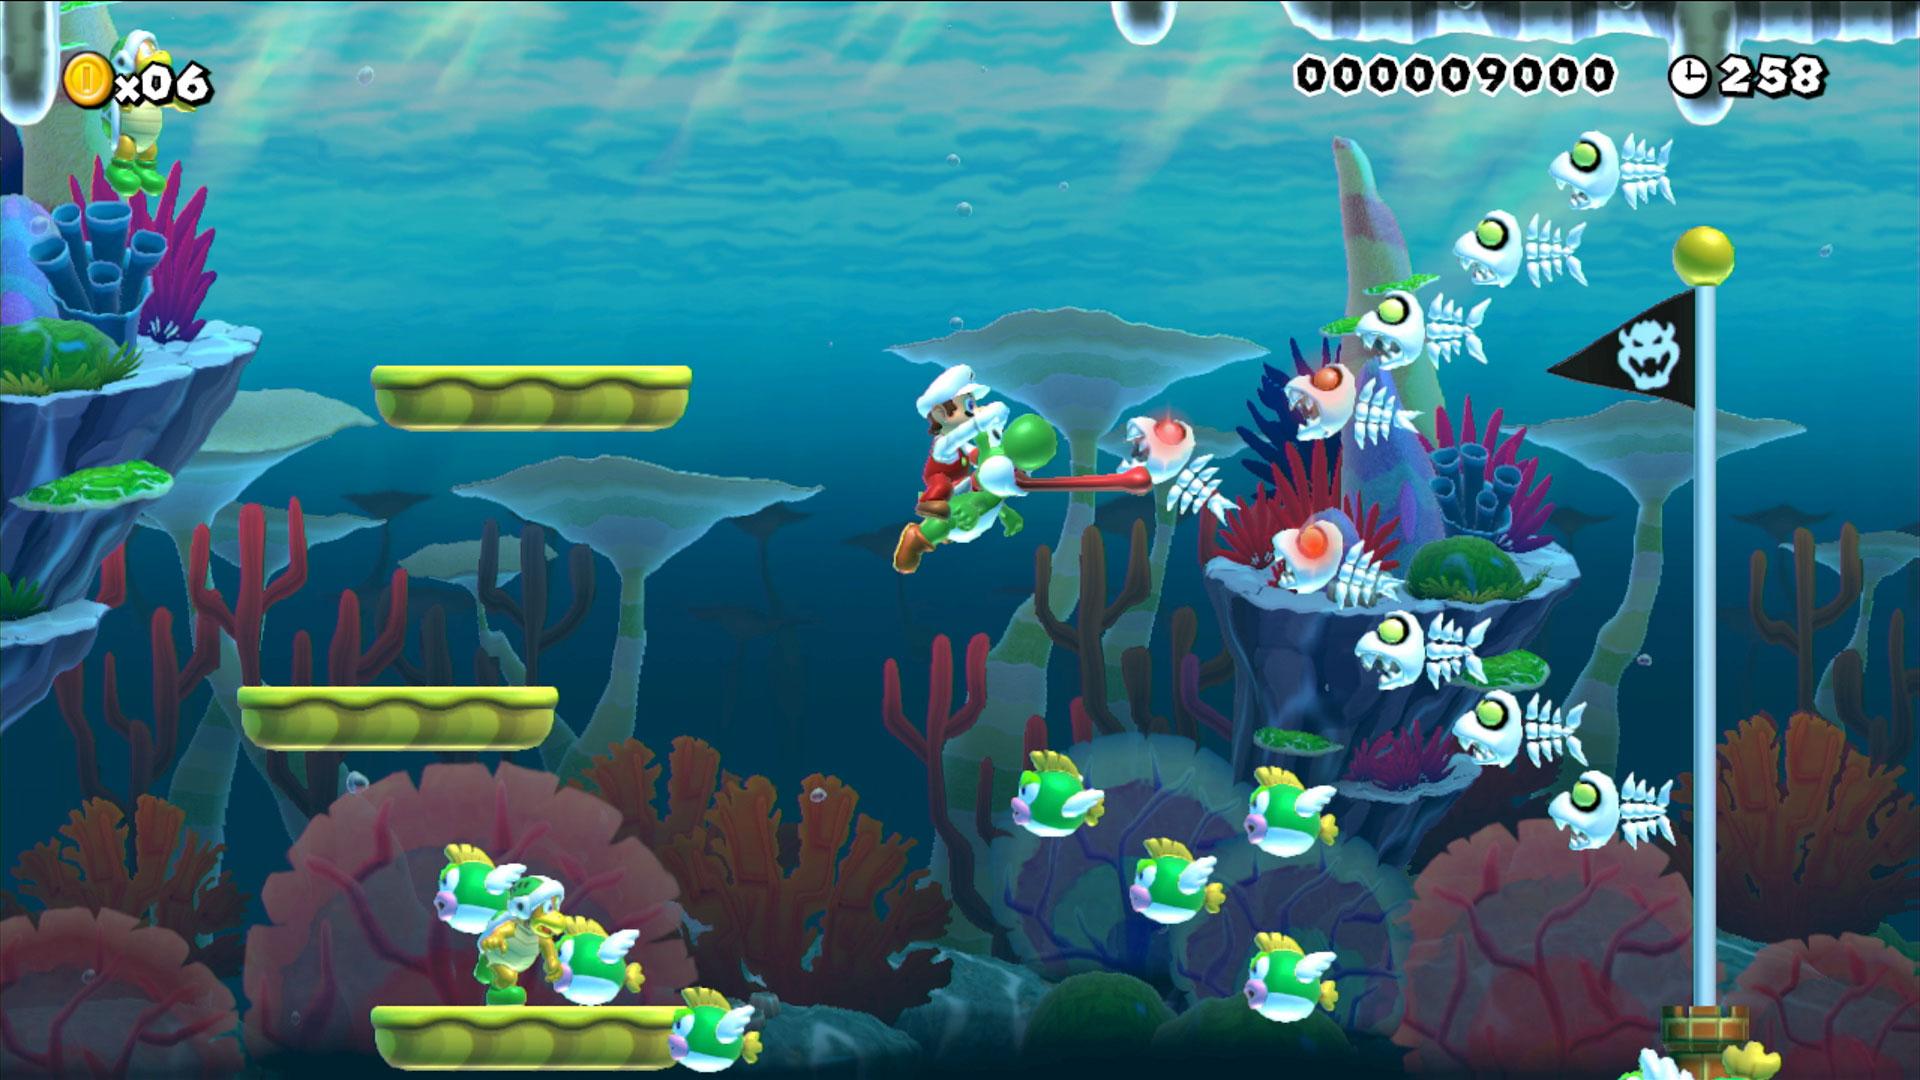 V nement nintendo post e3 2015 super mario maker for Mario go fish